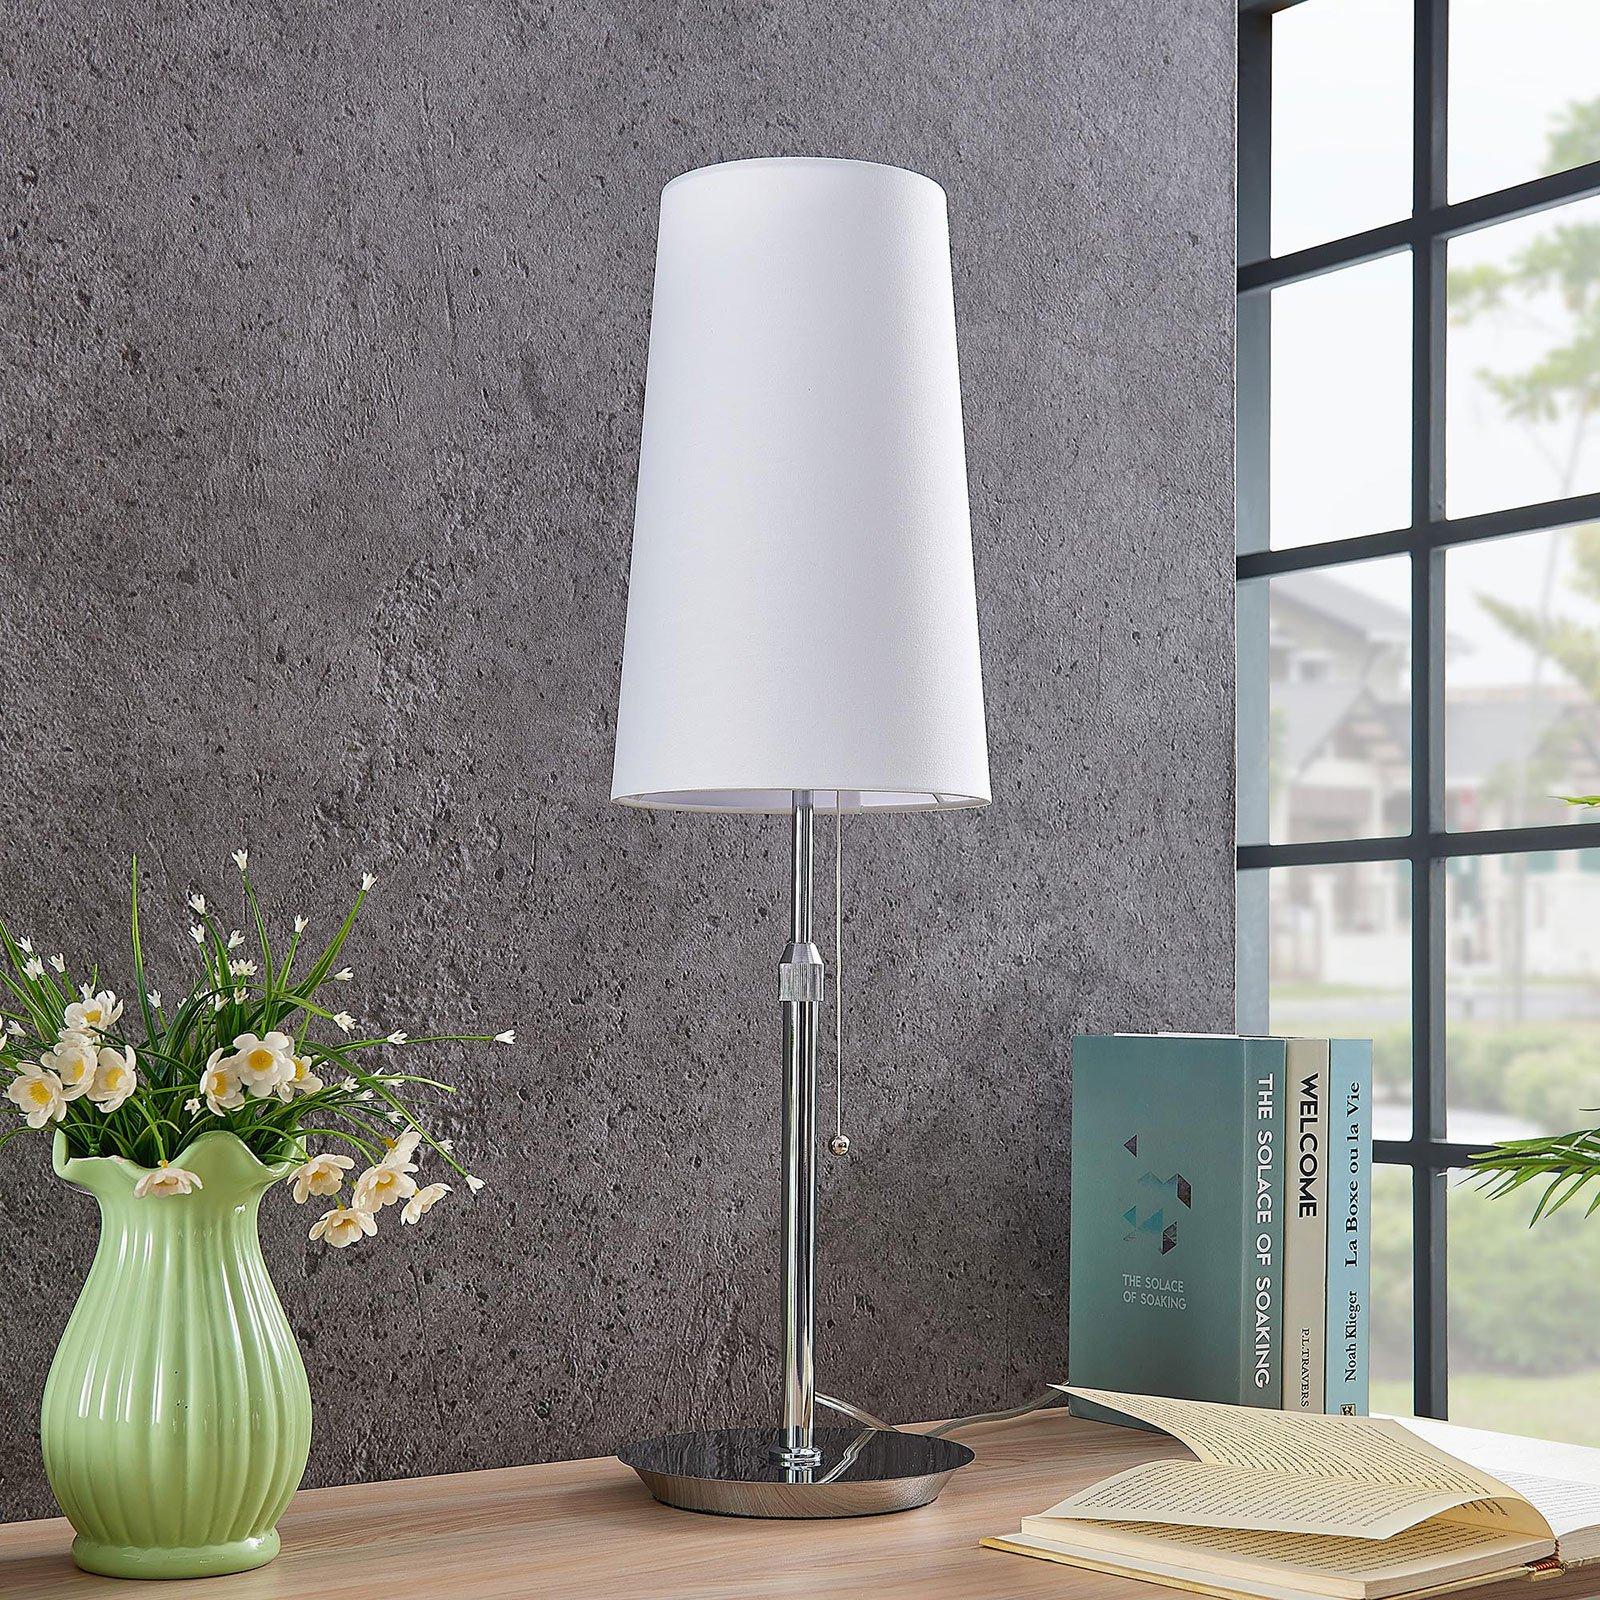 Lucande Pordis bordlampe, krom-hvit